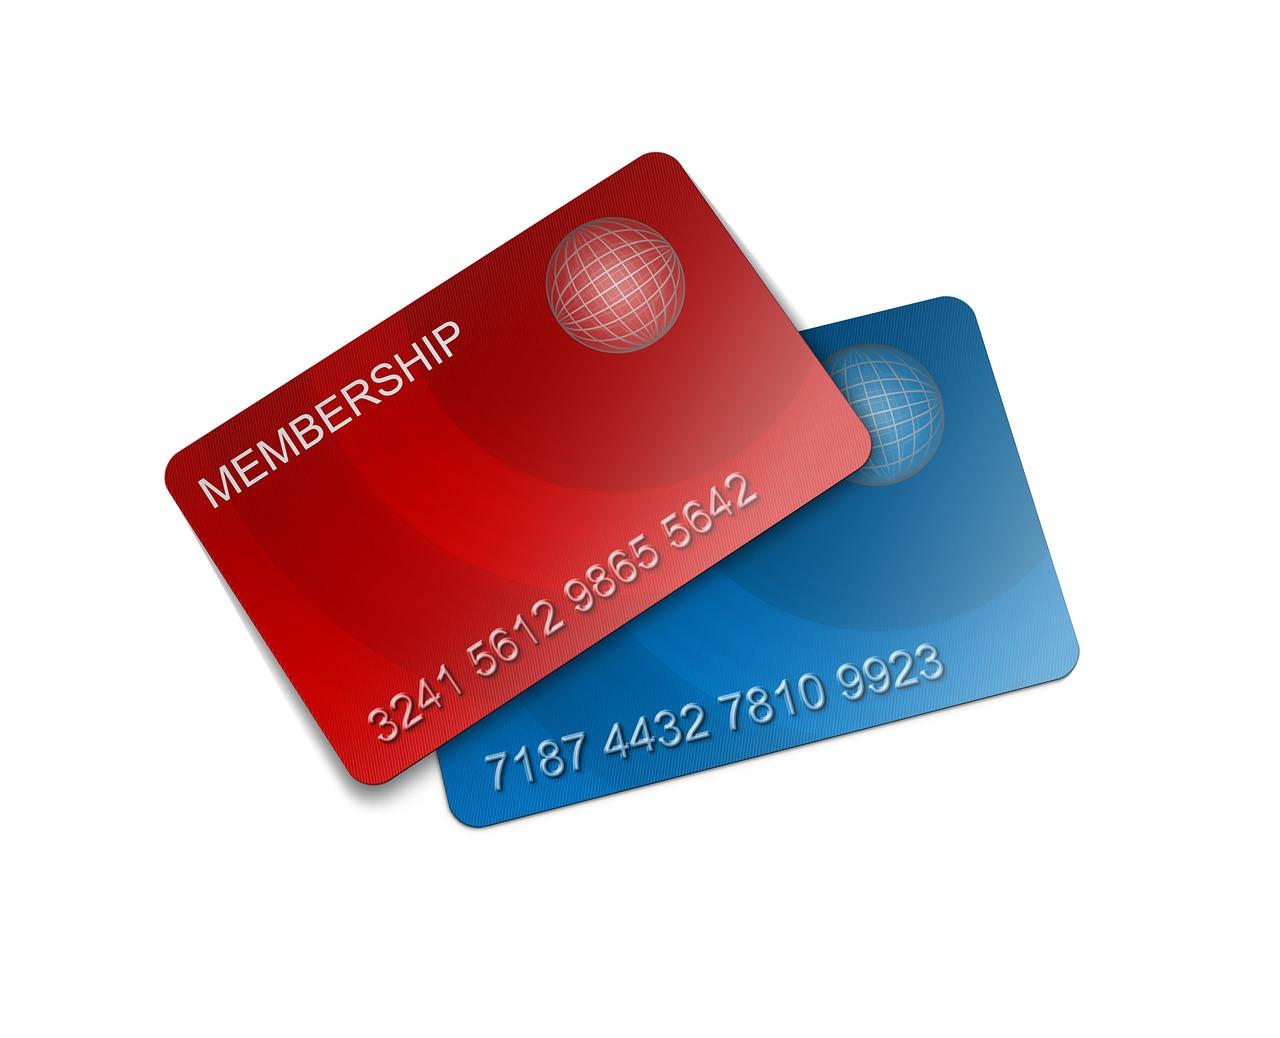 warum kreditkarte